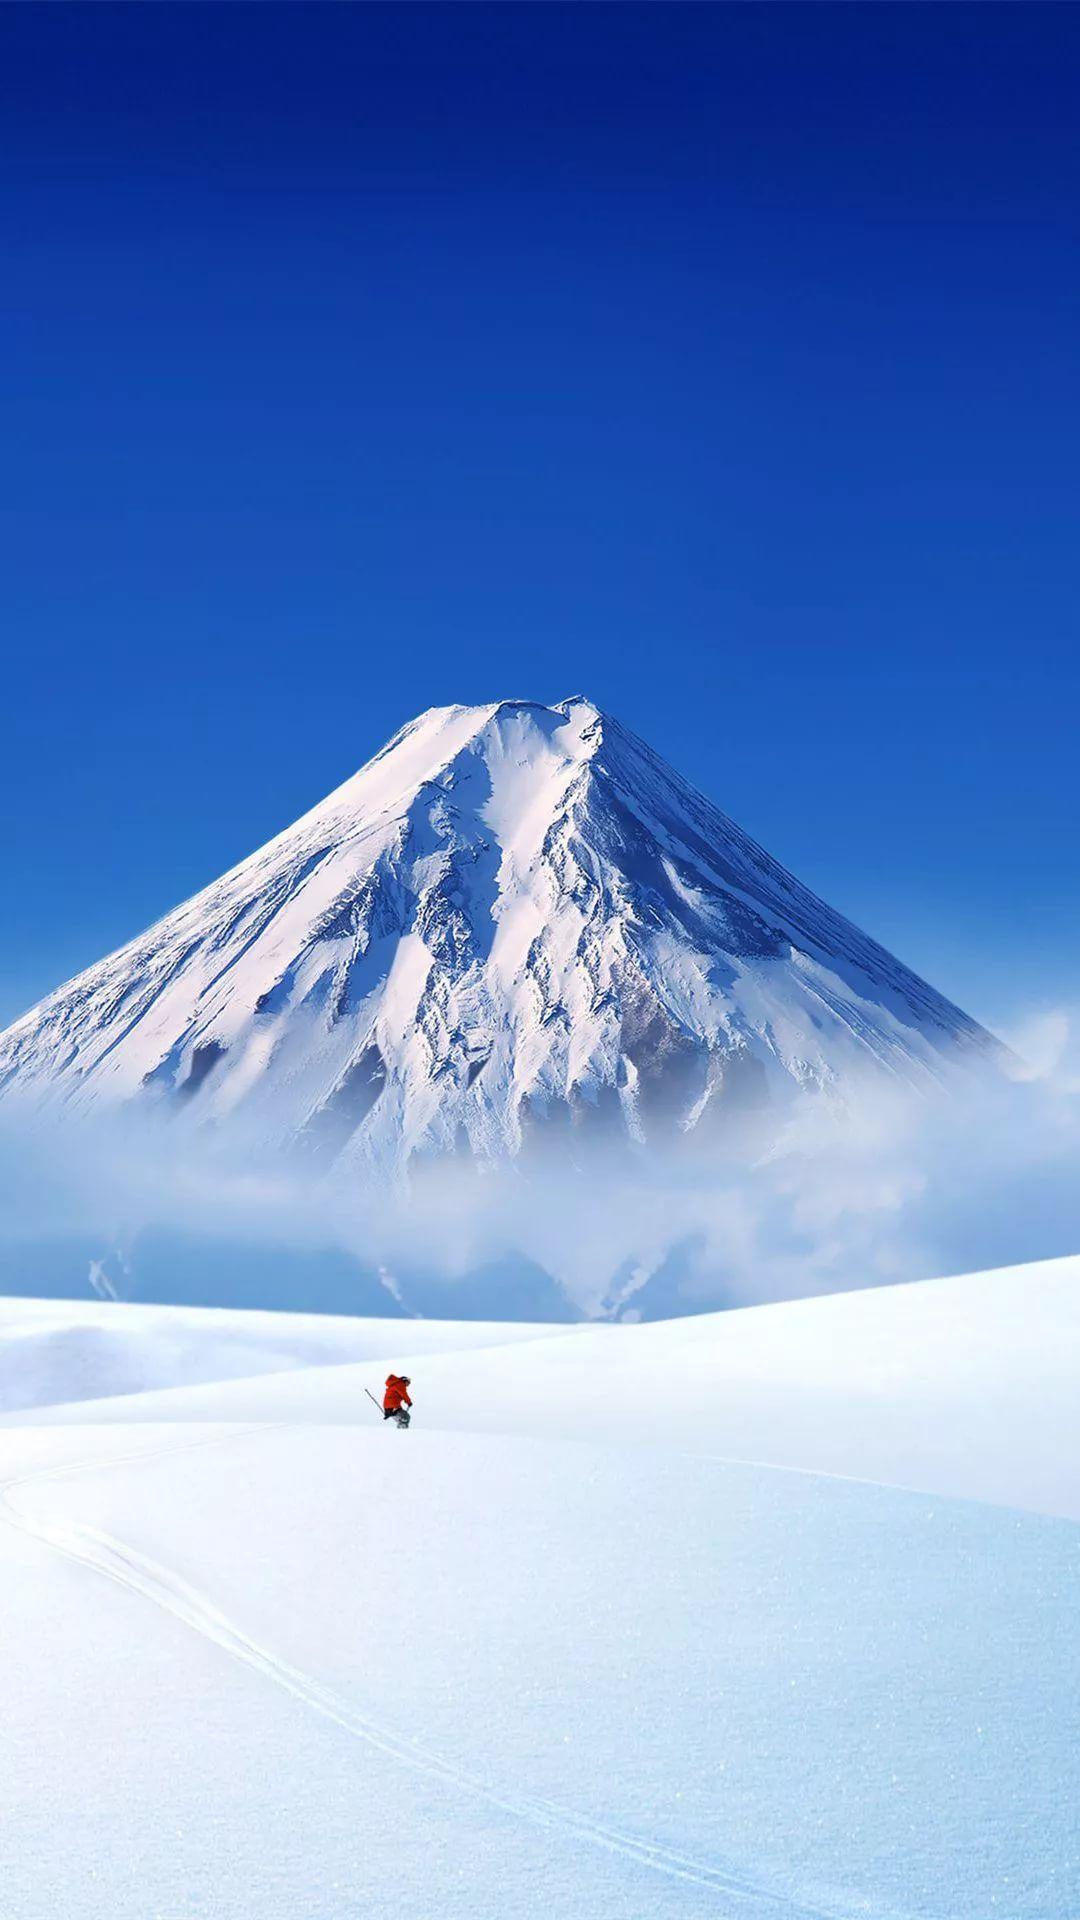 Mountain Wallpaper iPhone